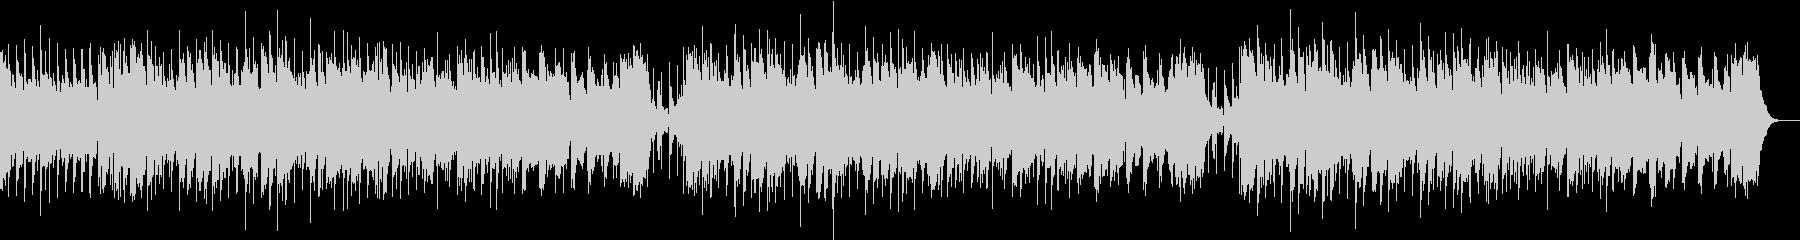 RPG通常バトルMIDI音源風ループ短めの未再生の波形